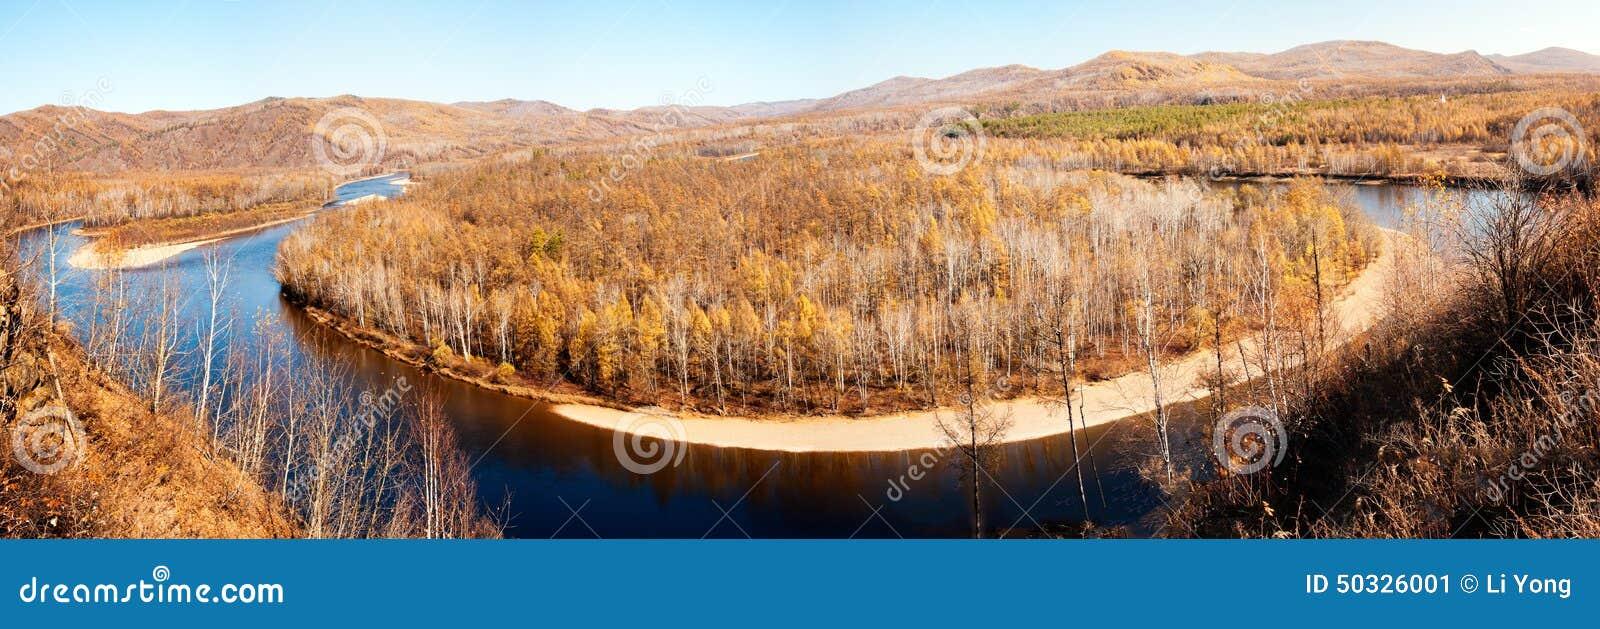 Hulun Buir China  city pictures gallery : Mordaga Autumn Scenery panorama Stock Photo Image: 50326001